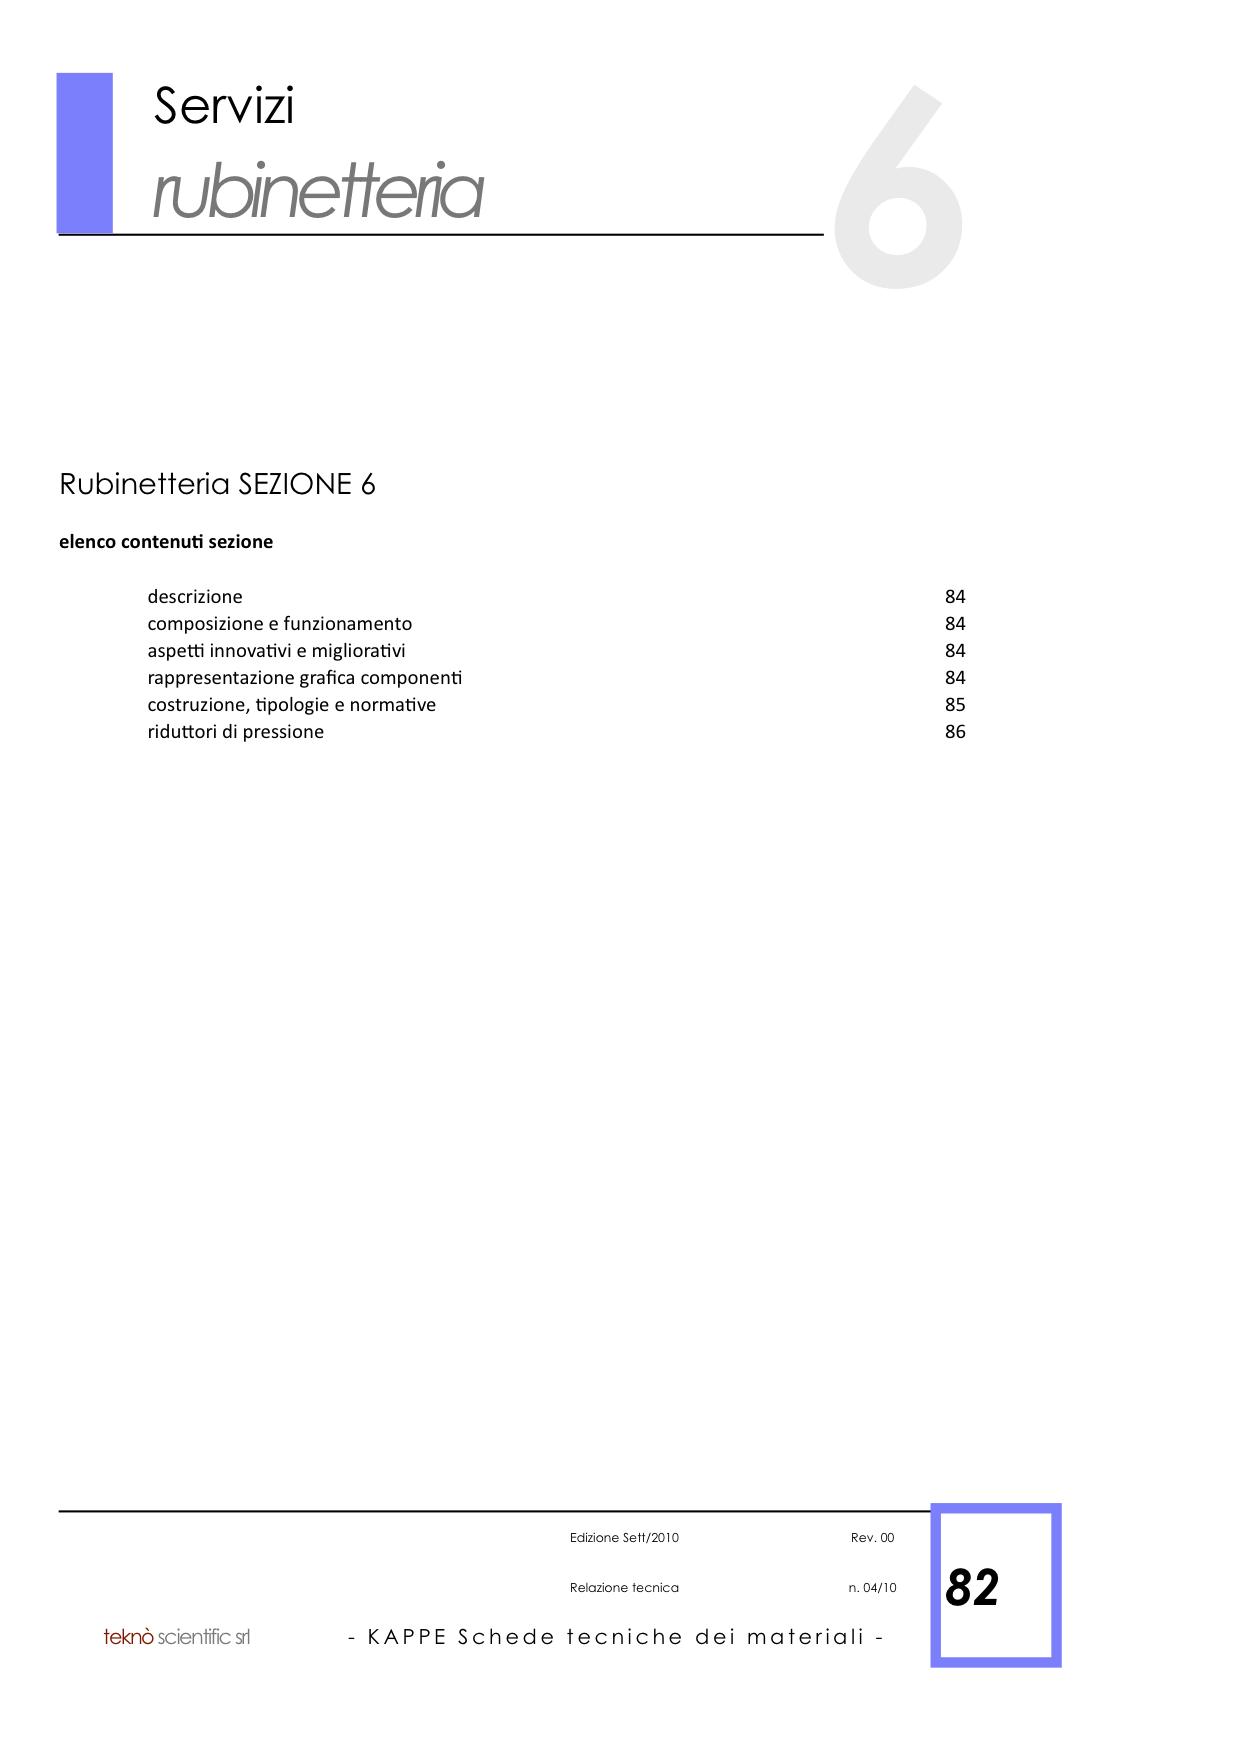 KAPPE Schede tecniche materiali copia 32.png